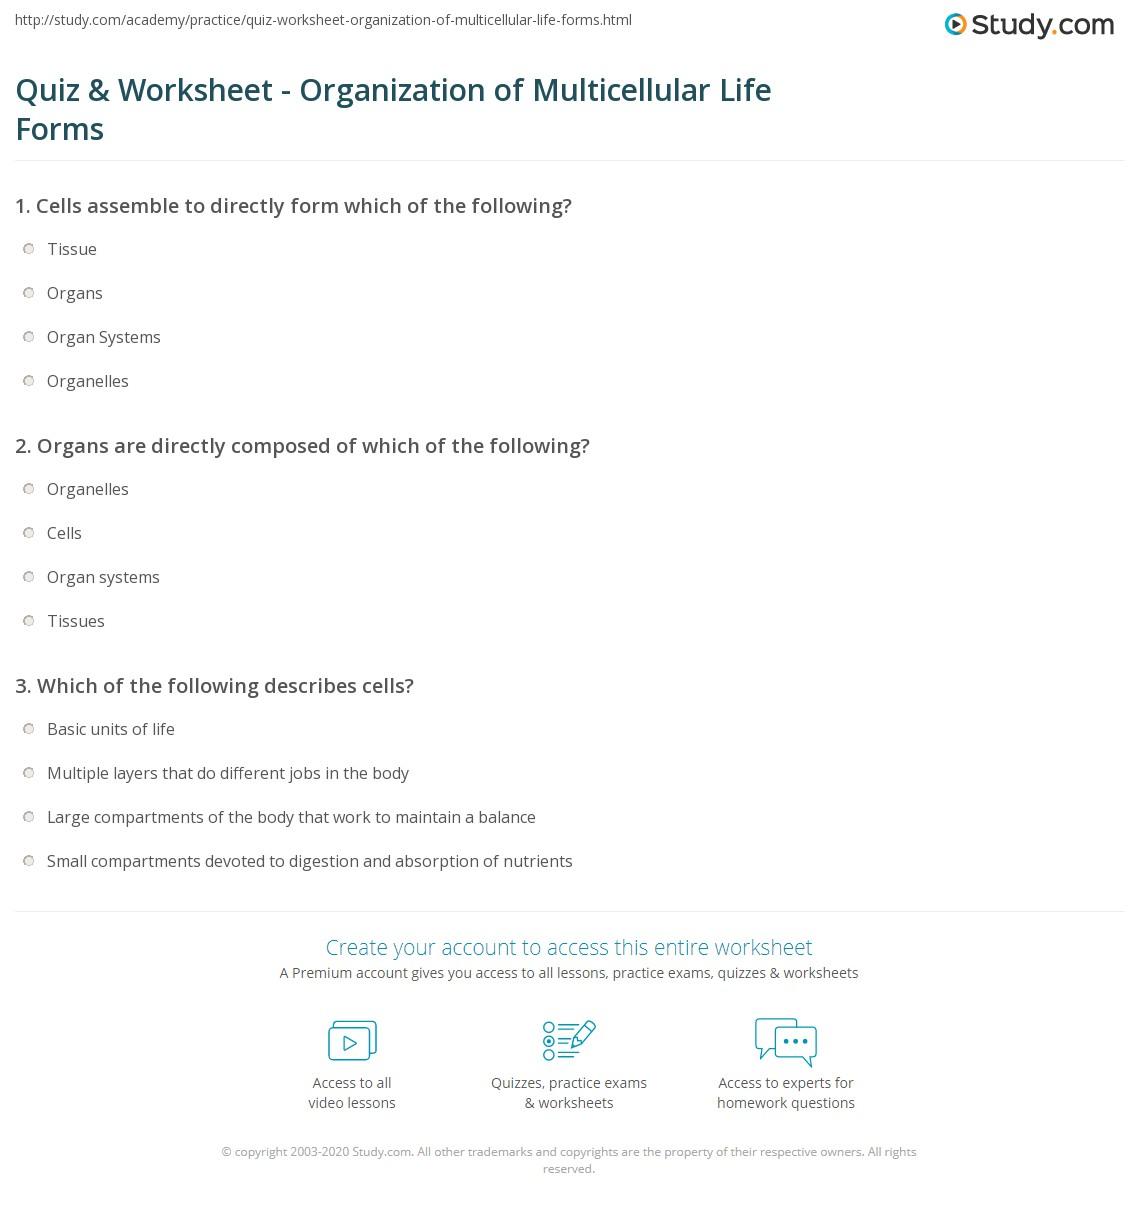 quiz worksheet organization of multicellular life forms study com rh study com section 5 multicellular life study guide a answers multicellular life study guide 5.5 answer key